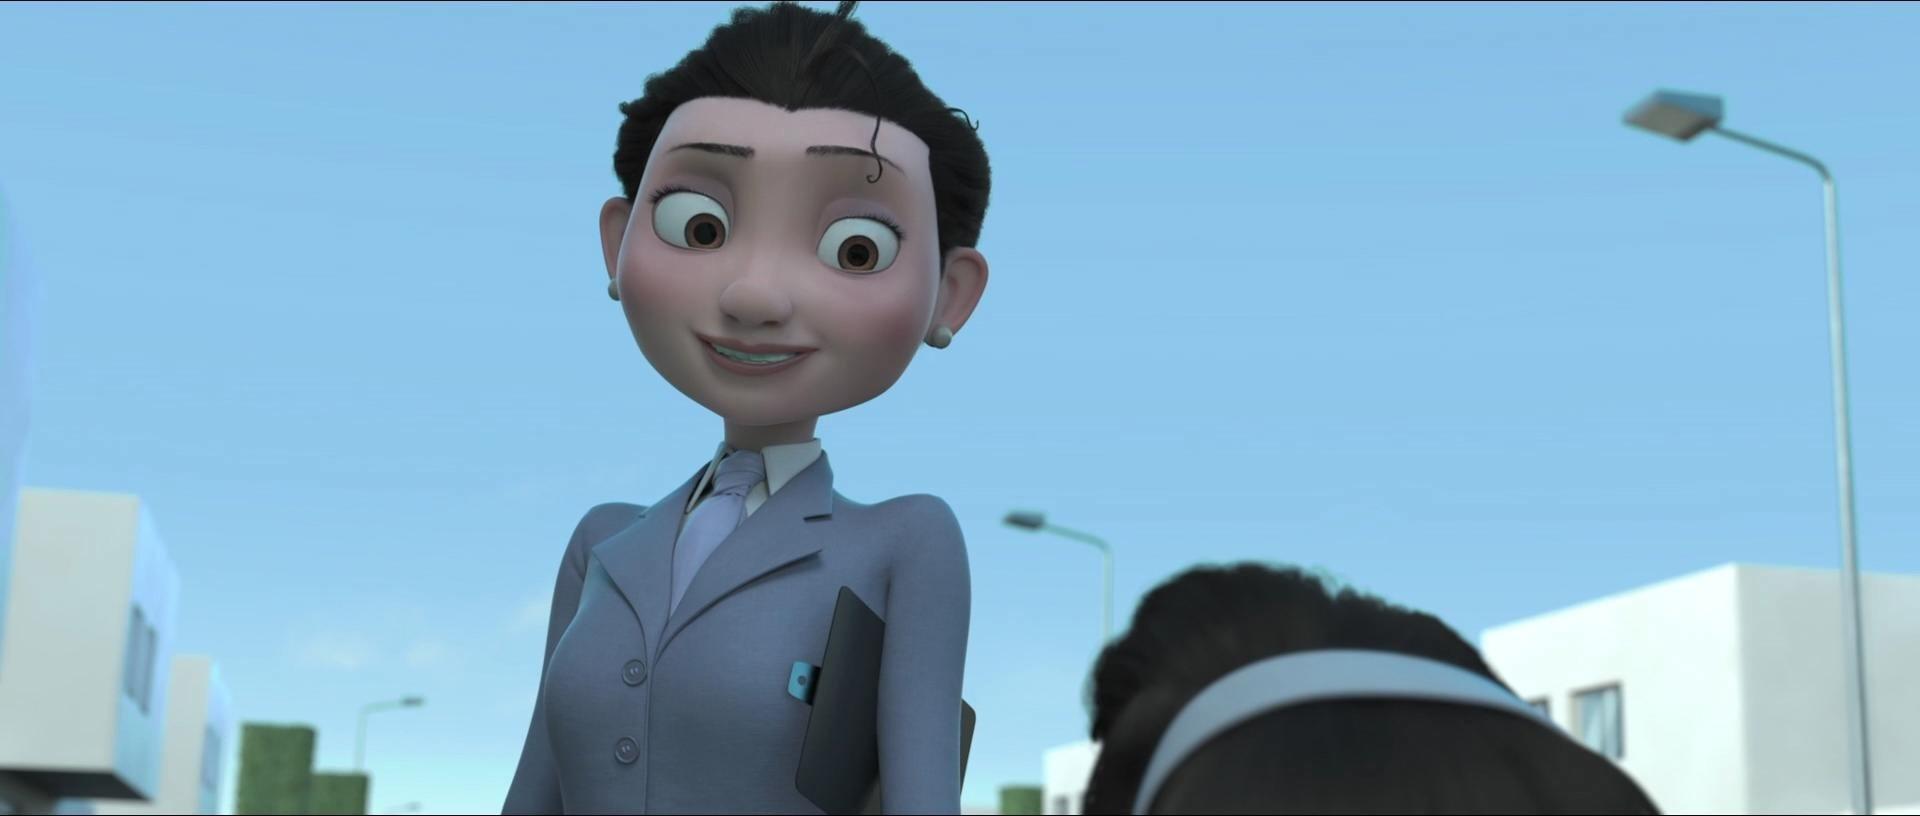 Angela Smaldone The Little Prince